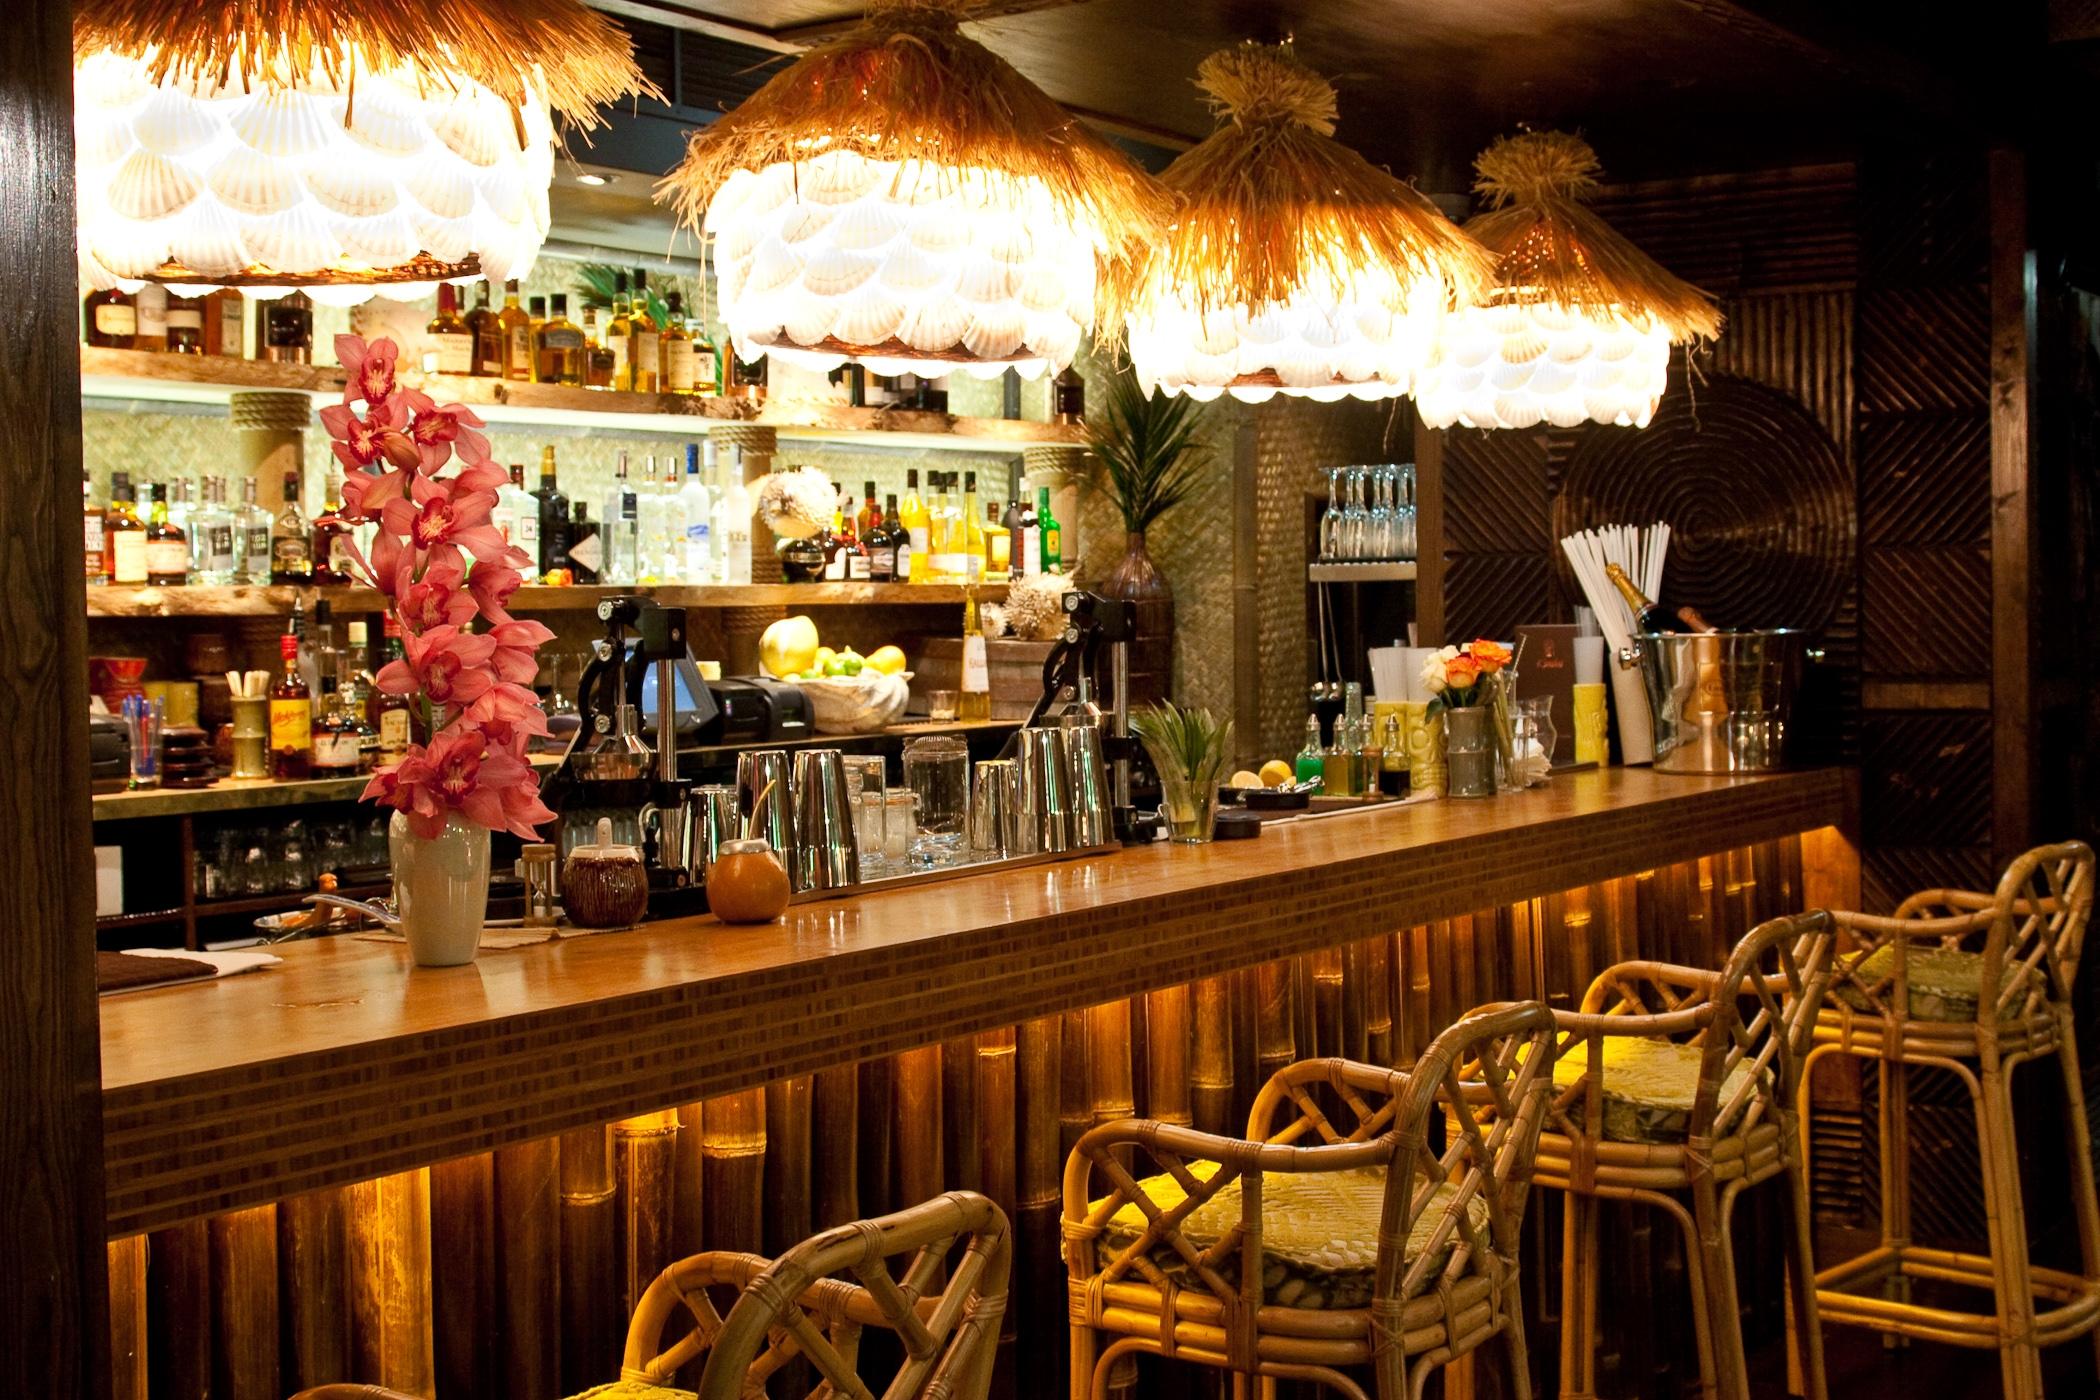 kanaloa new bar tiger tiger, newcastle 2012